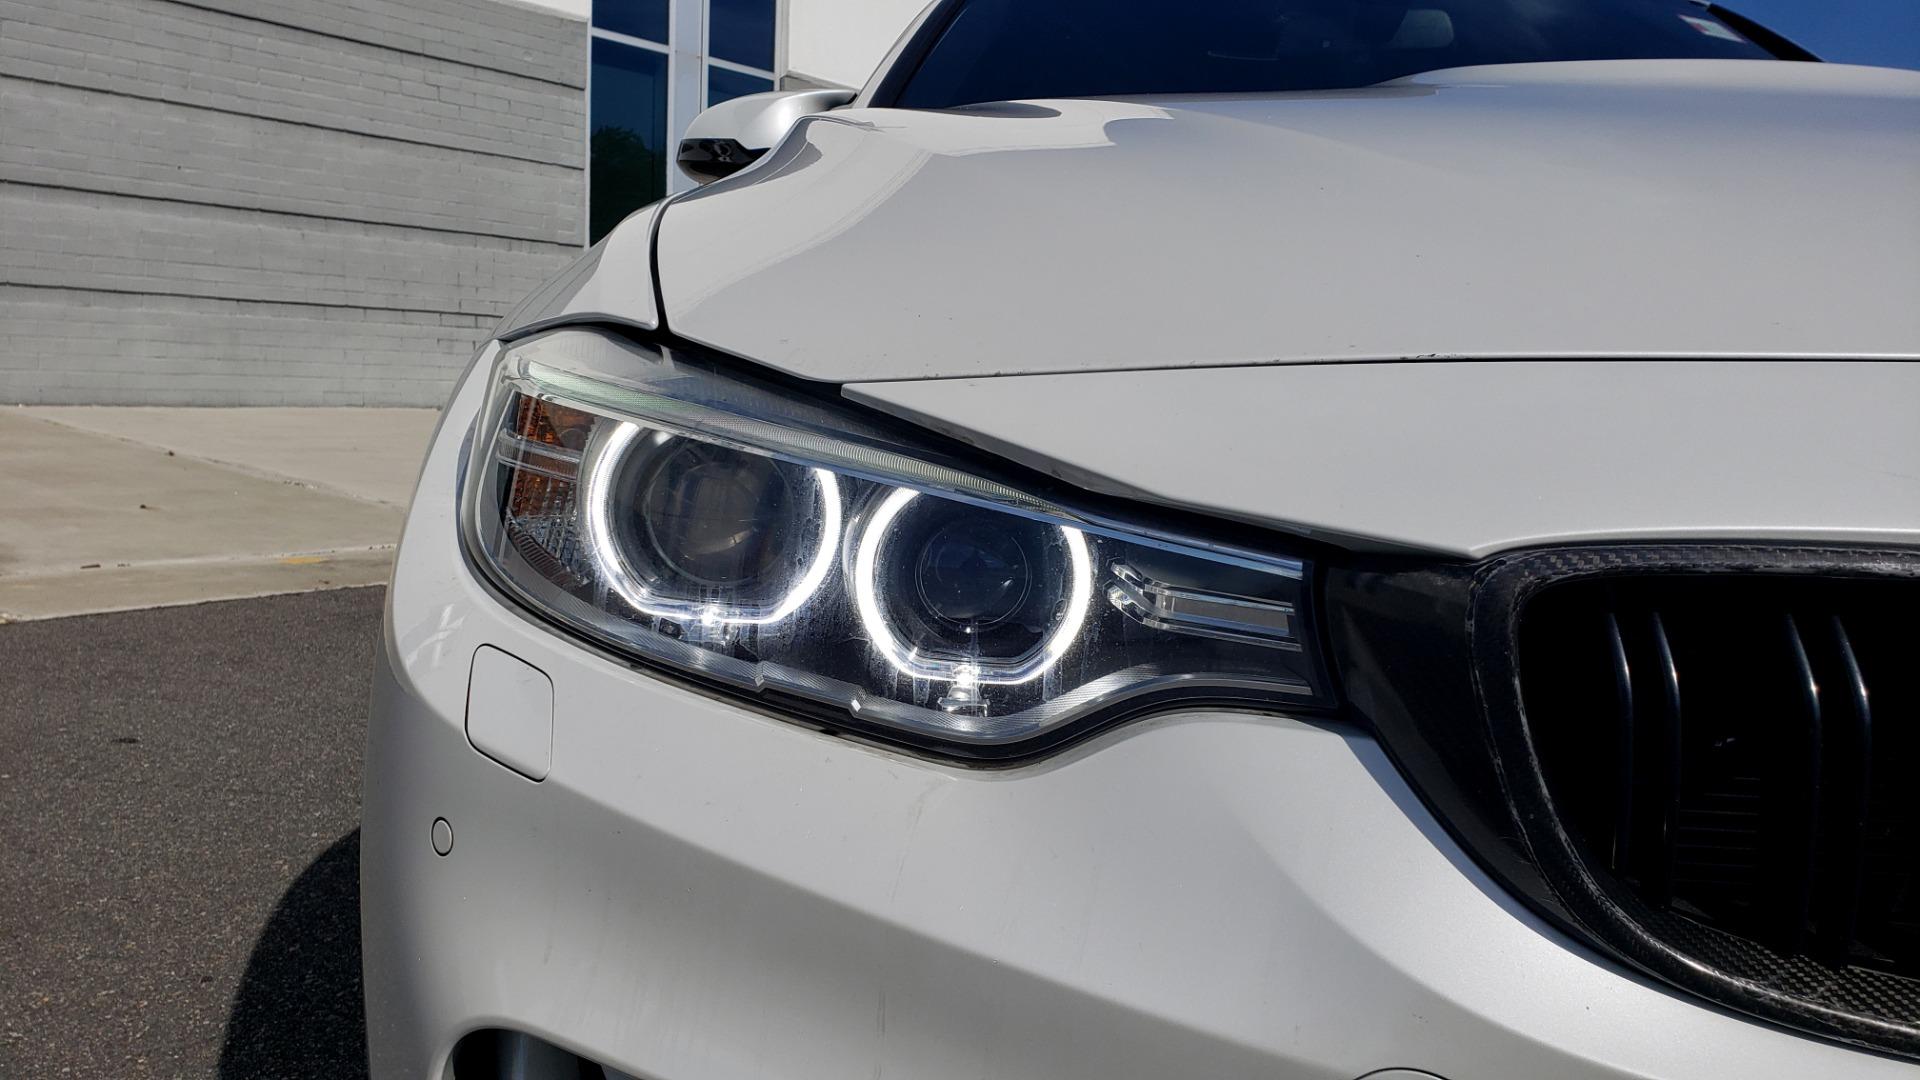 Used 2016 BMW M3 SEDAN / EXECUTIVE PKG / M-SUSPENSION / HARMAN/KARDON SOUND for sale Sold at Formula Imports in Charlotte NC 28227 17